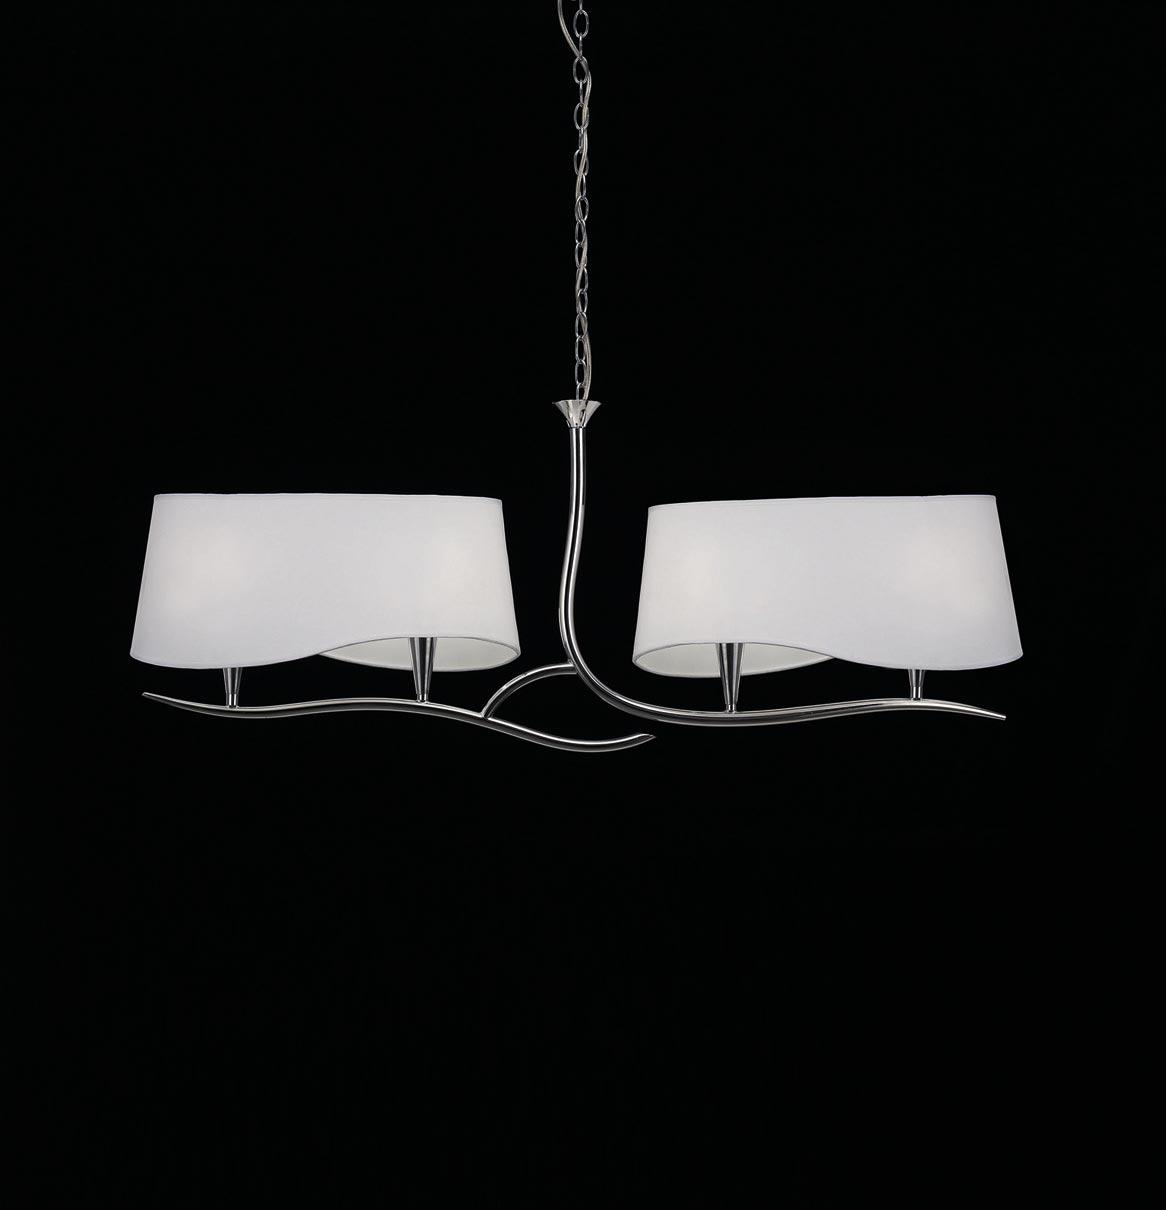 Lámpara lineal cromo blanco NINETTE 4 luces